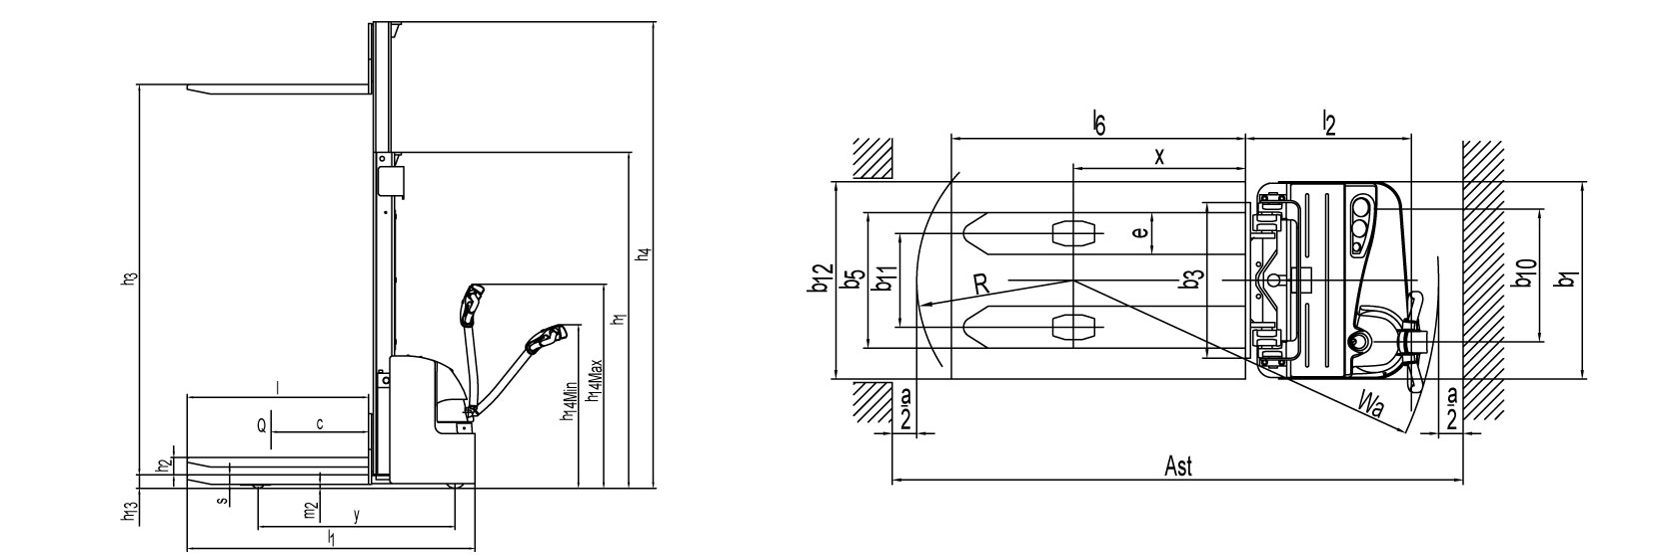 draw.jpg (134 KB)